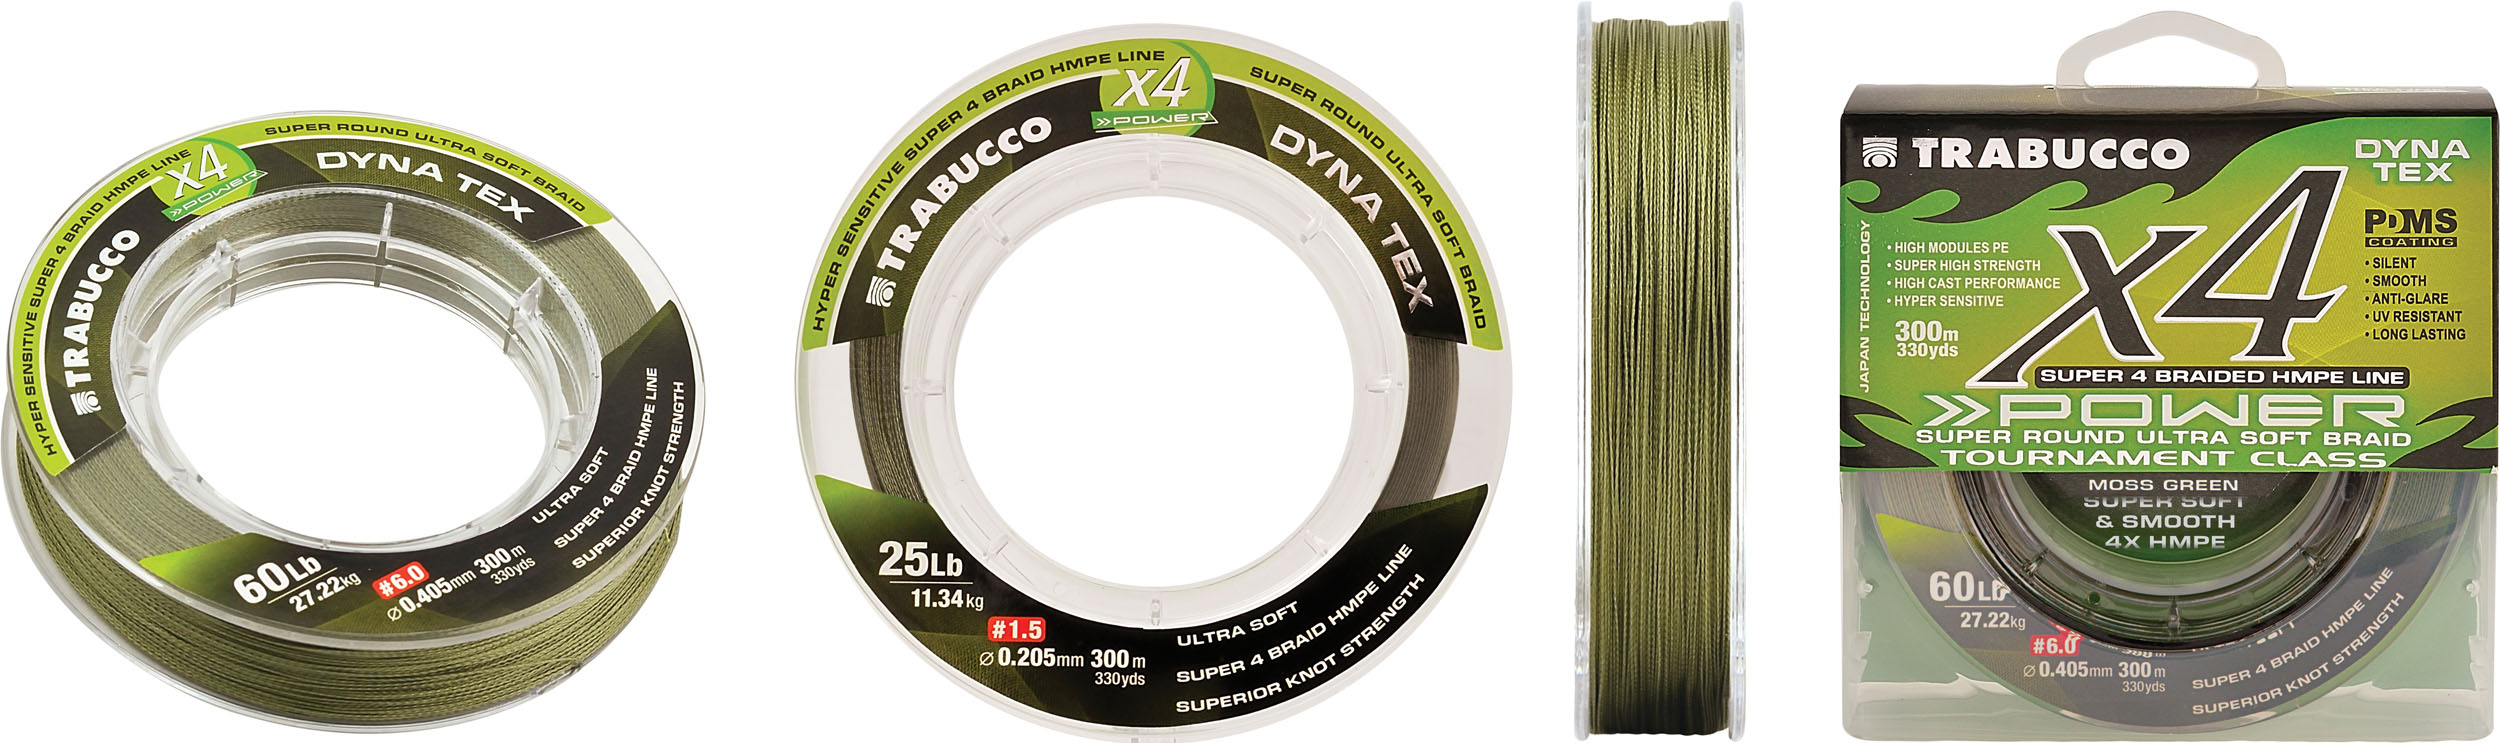 Trabucco Dyna Tex X4 Power 300m 0.370mm MOSS GREEN